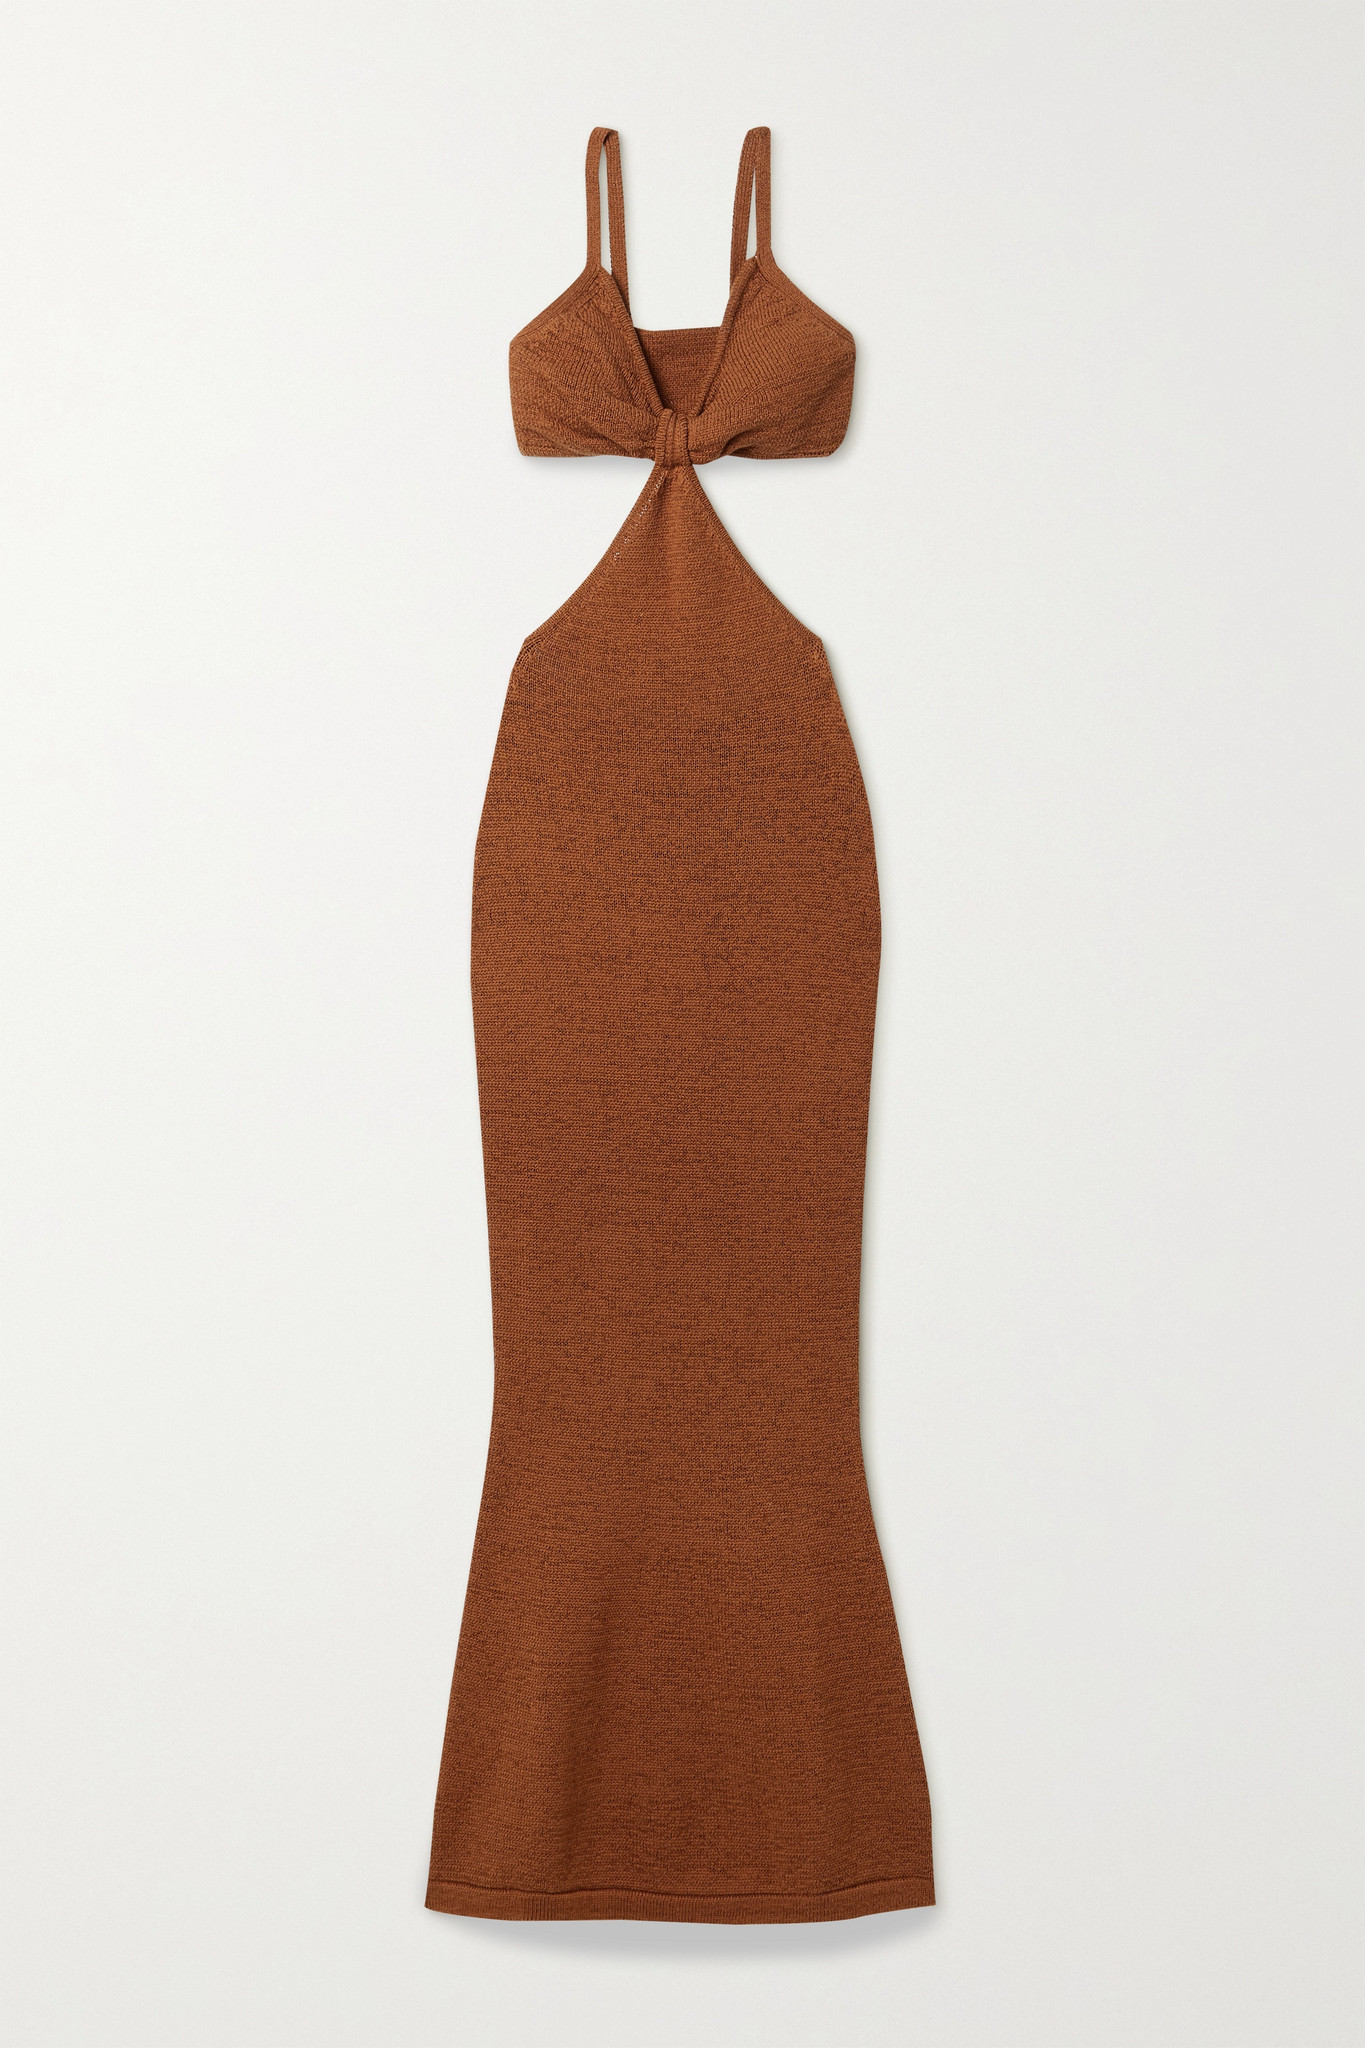 CULT GAIA - Serita 挖剪棉质混纺超长连衣裙 - 红色 - x small